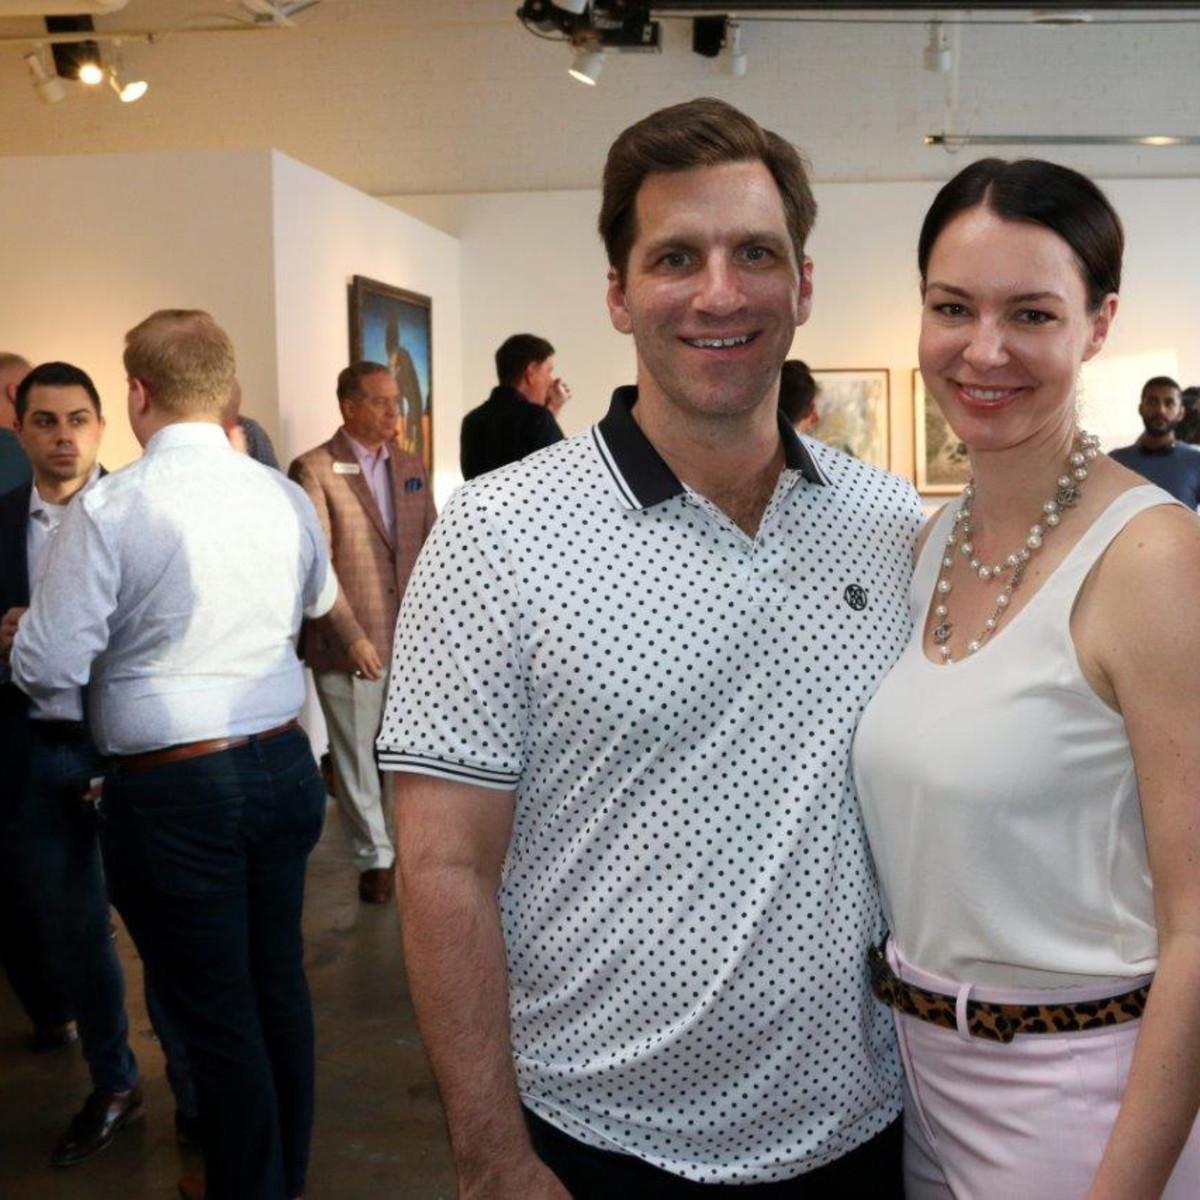 Jason and Brittanie Oleniczak